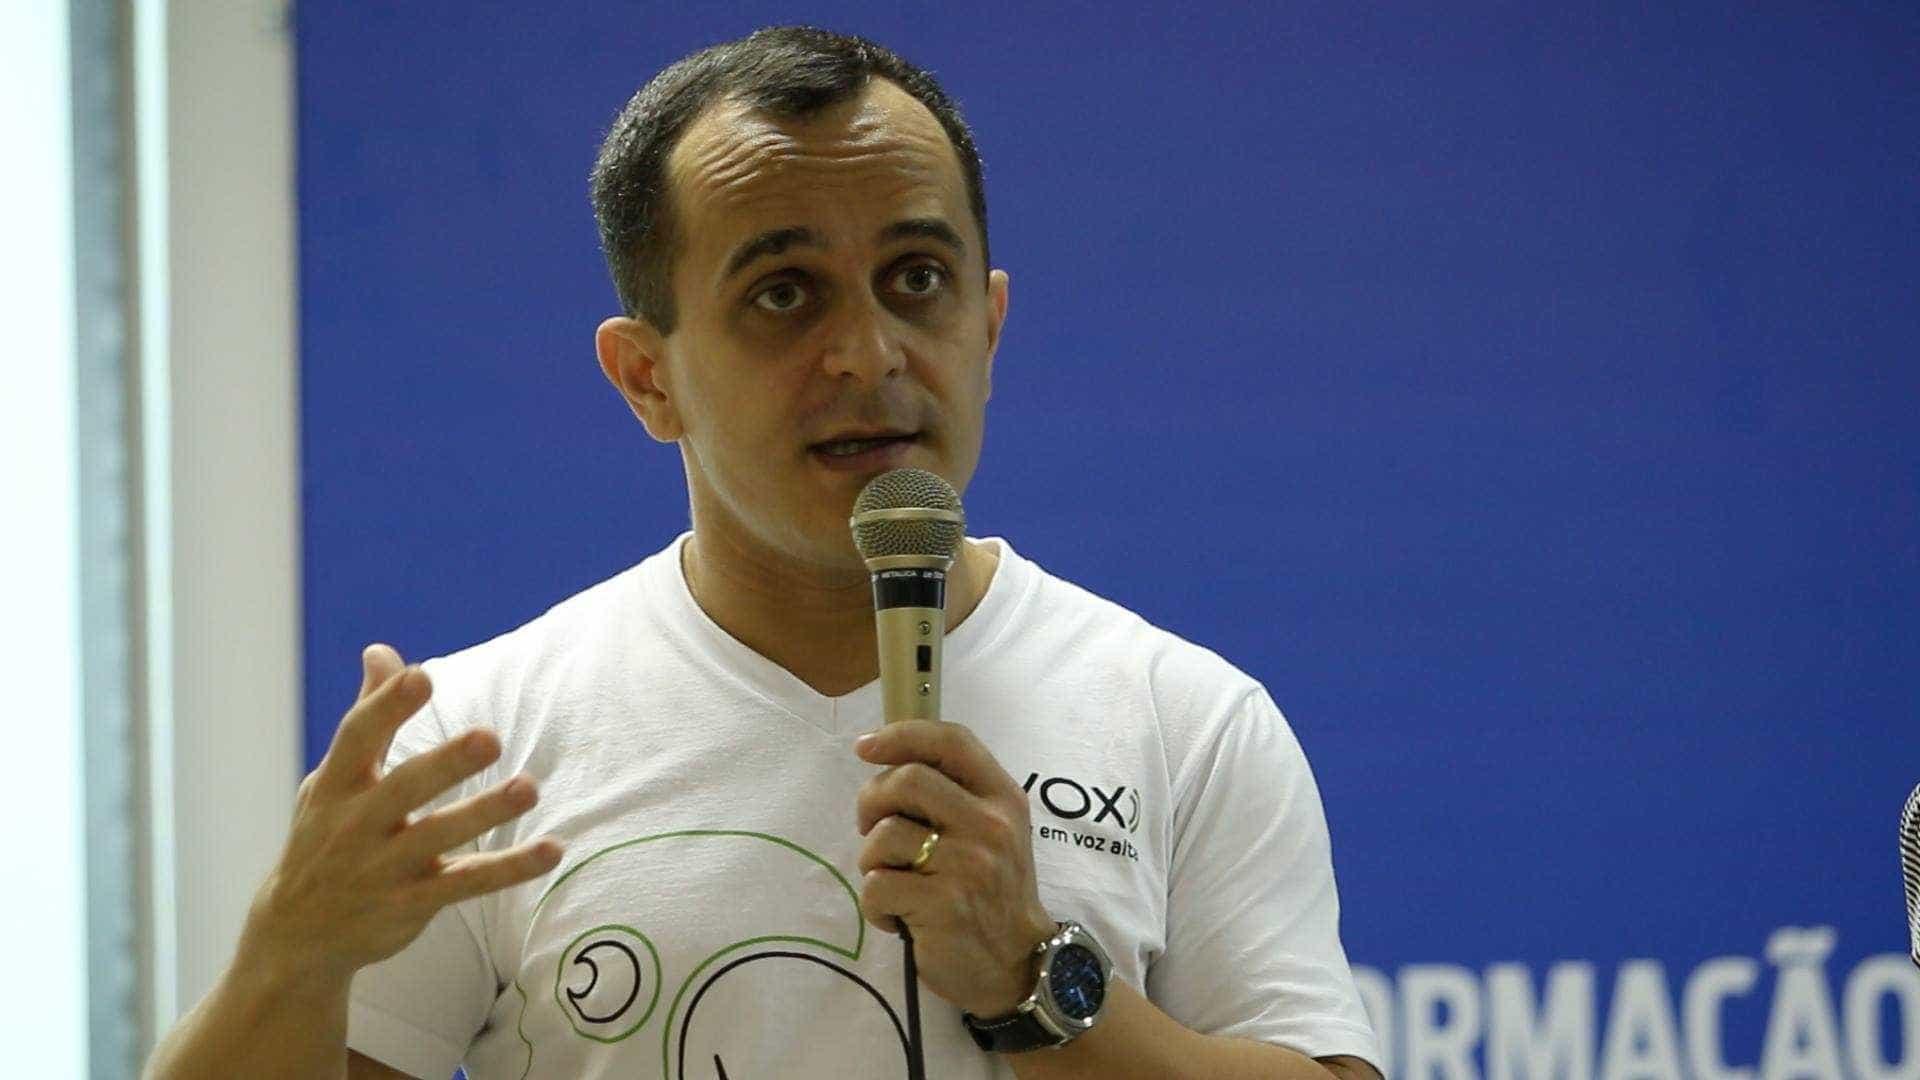 Empreendedor social brasileiro lidera mesa no Fórum Econômico Mundial